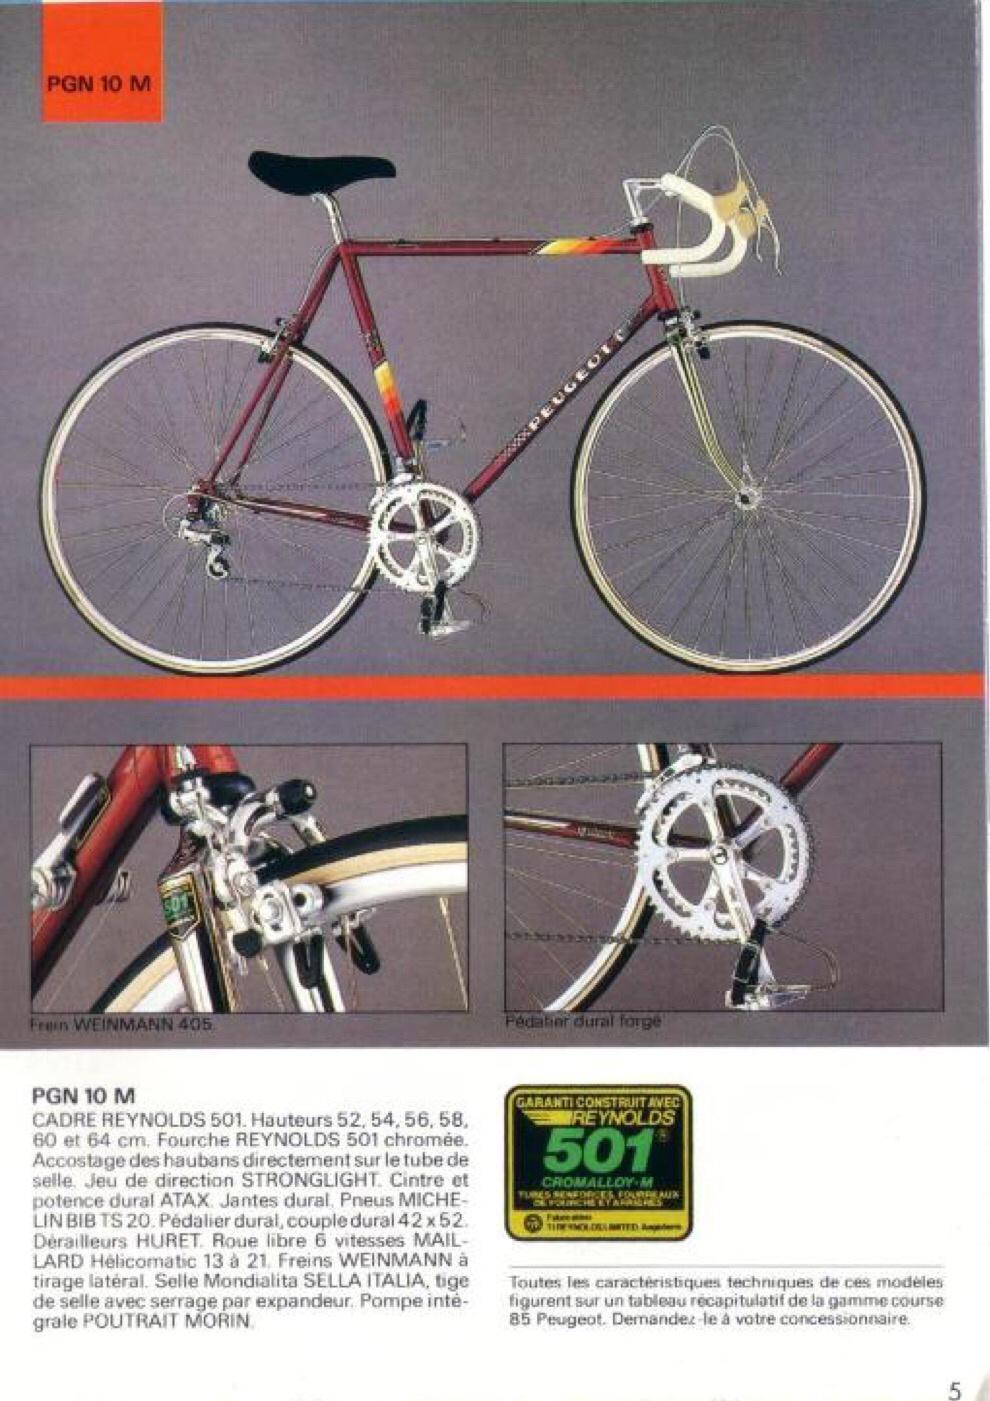 Peugeot PGN10 de 1985 IzbYl7